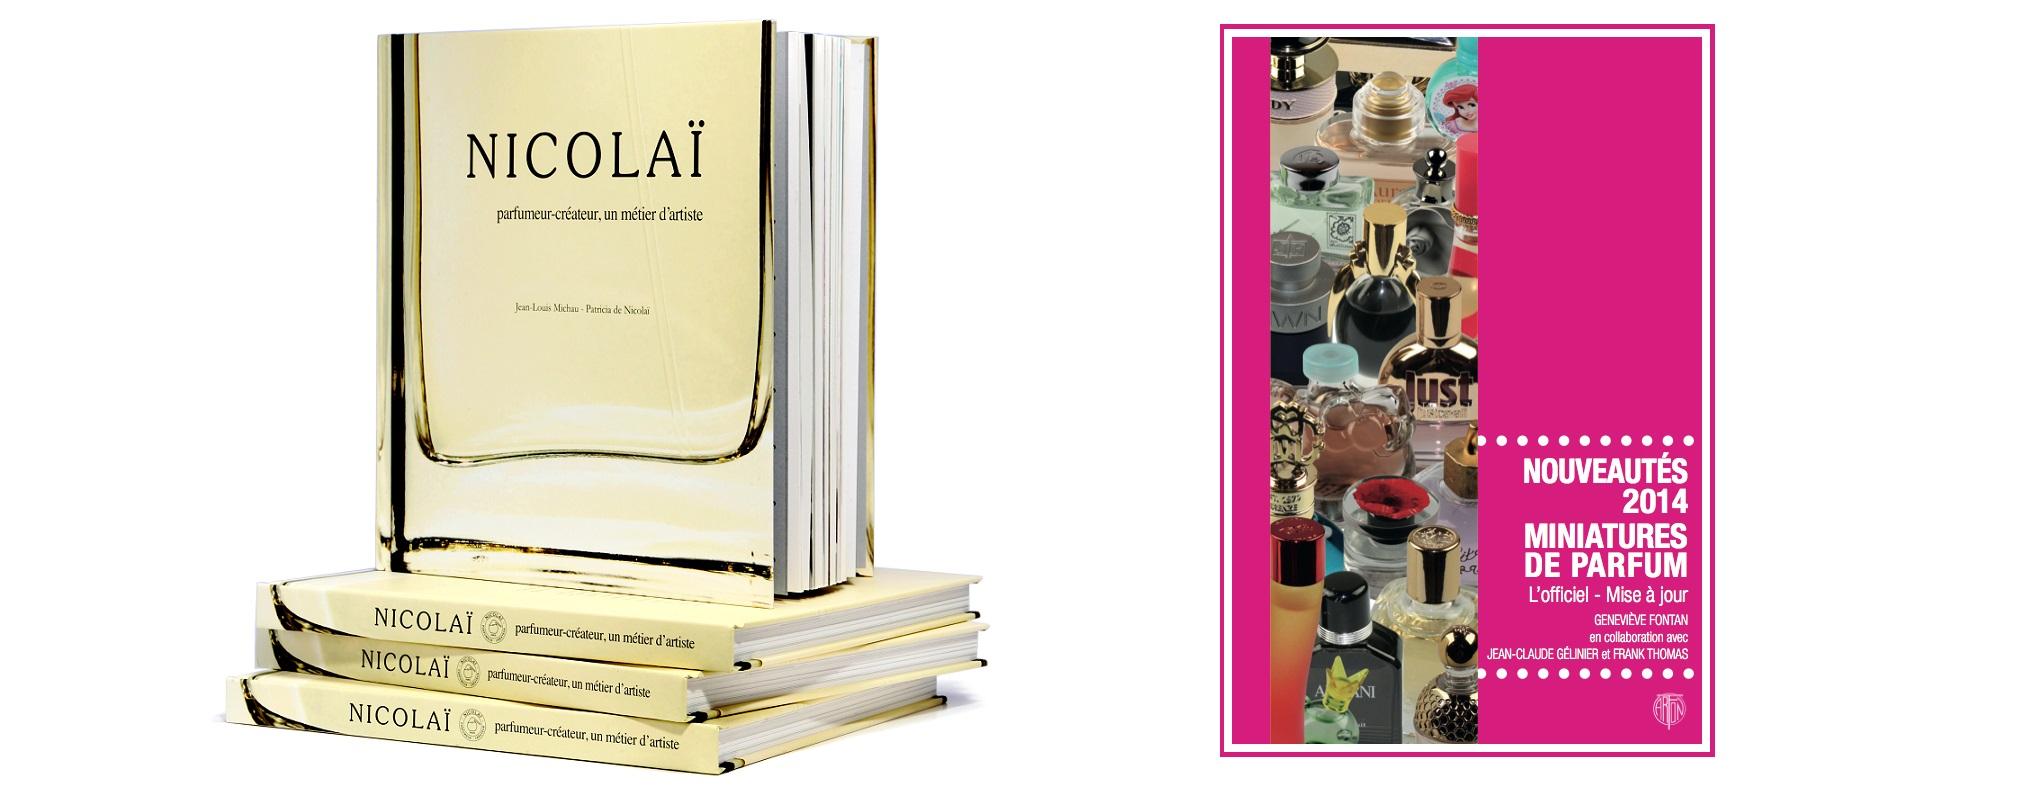 livres_nicolai_miniatures 2014